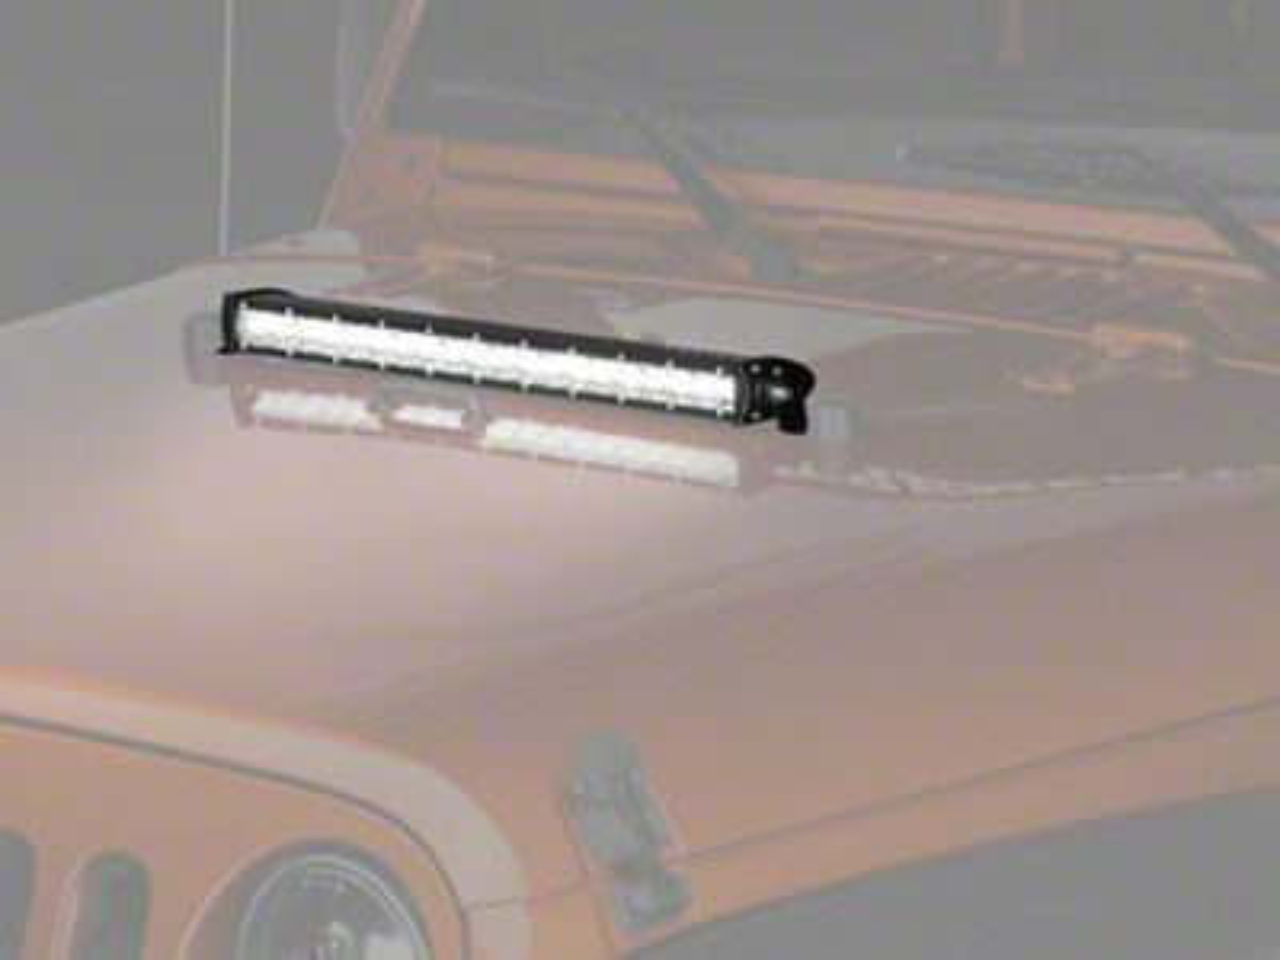 Raxiom 23.3 in. Slim LED Light Bar - Flood/Spot Combo (87-19 Jeep Wrangler YJ, TJ, JK & JL)